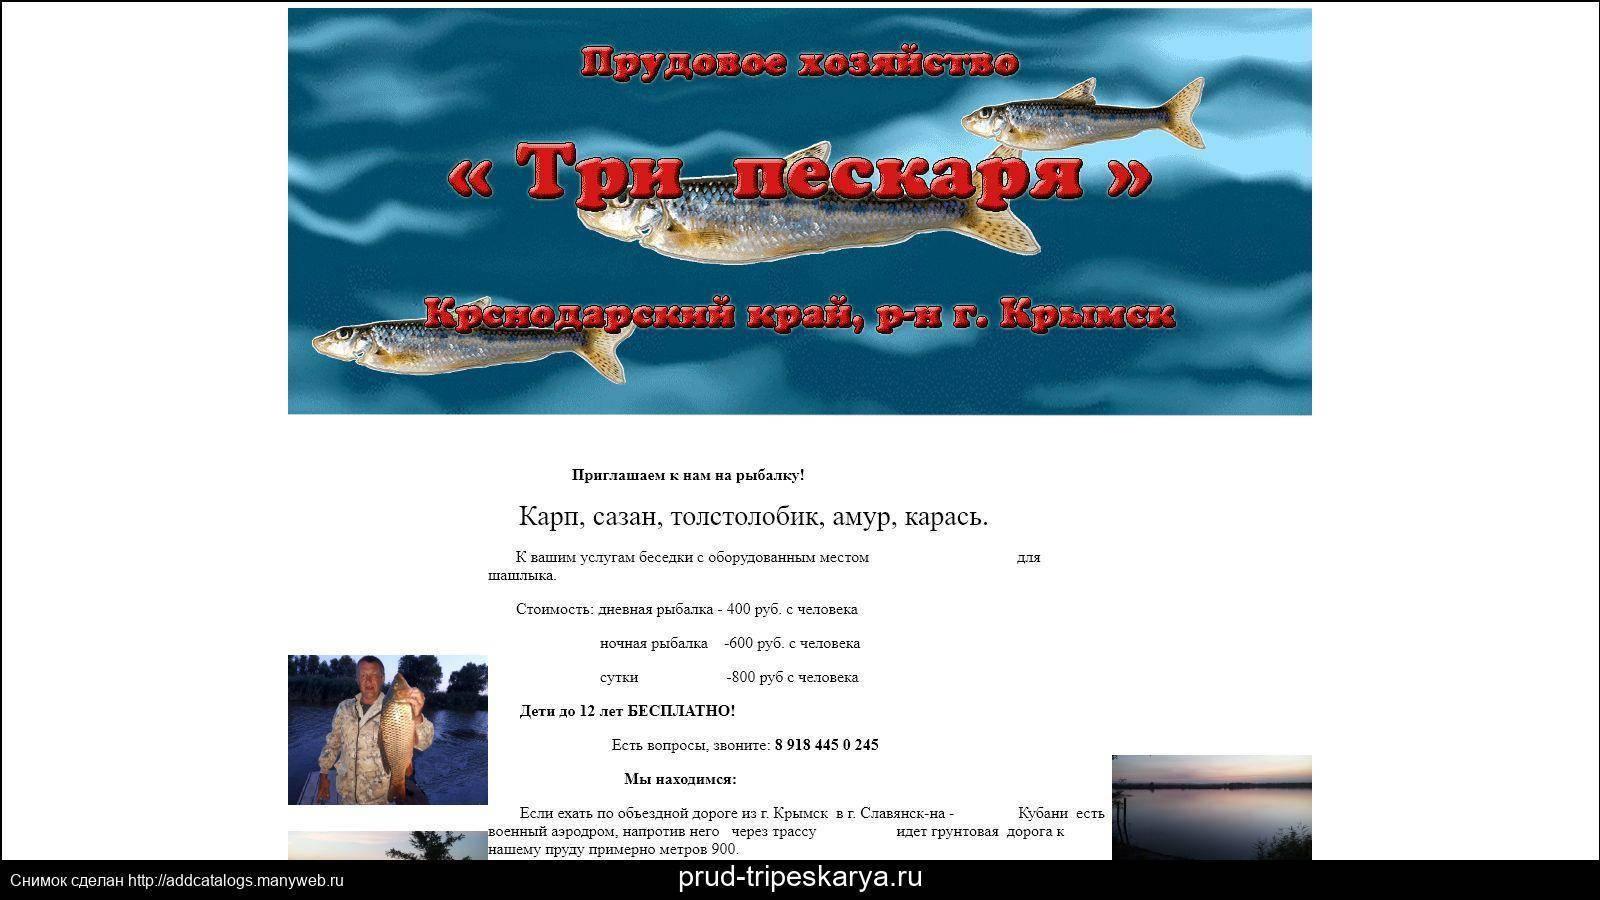 Рыбалка в краснодарском крае | (23) карта рыболовных мест